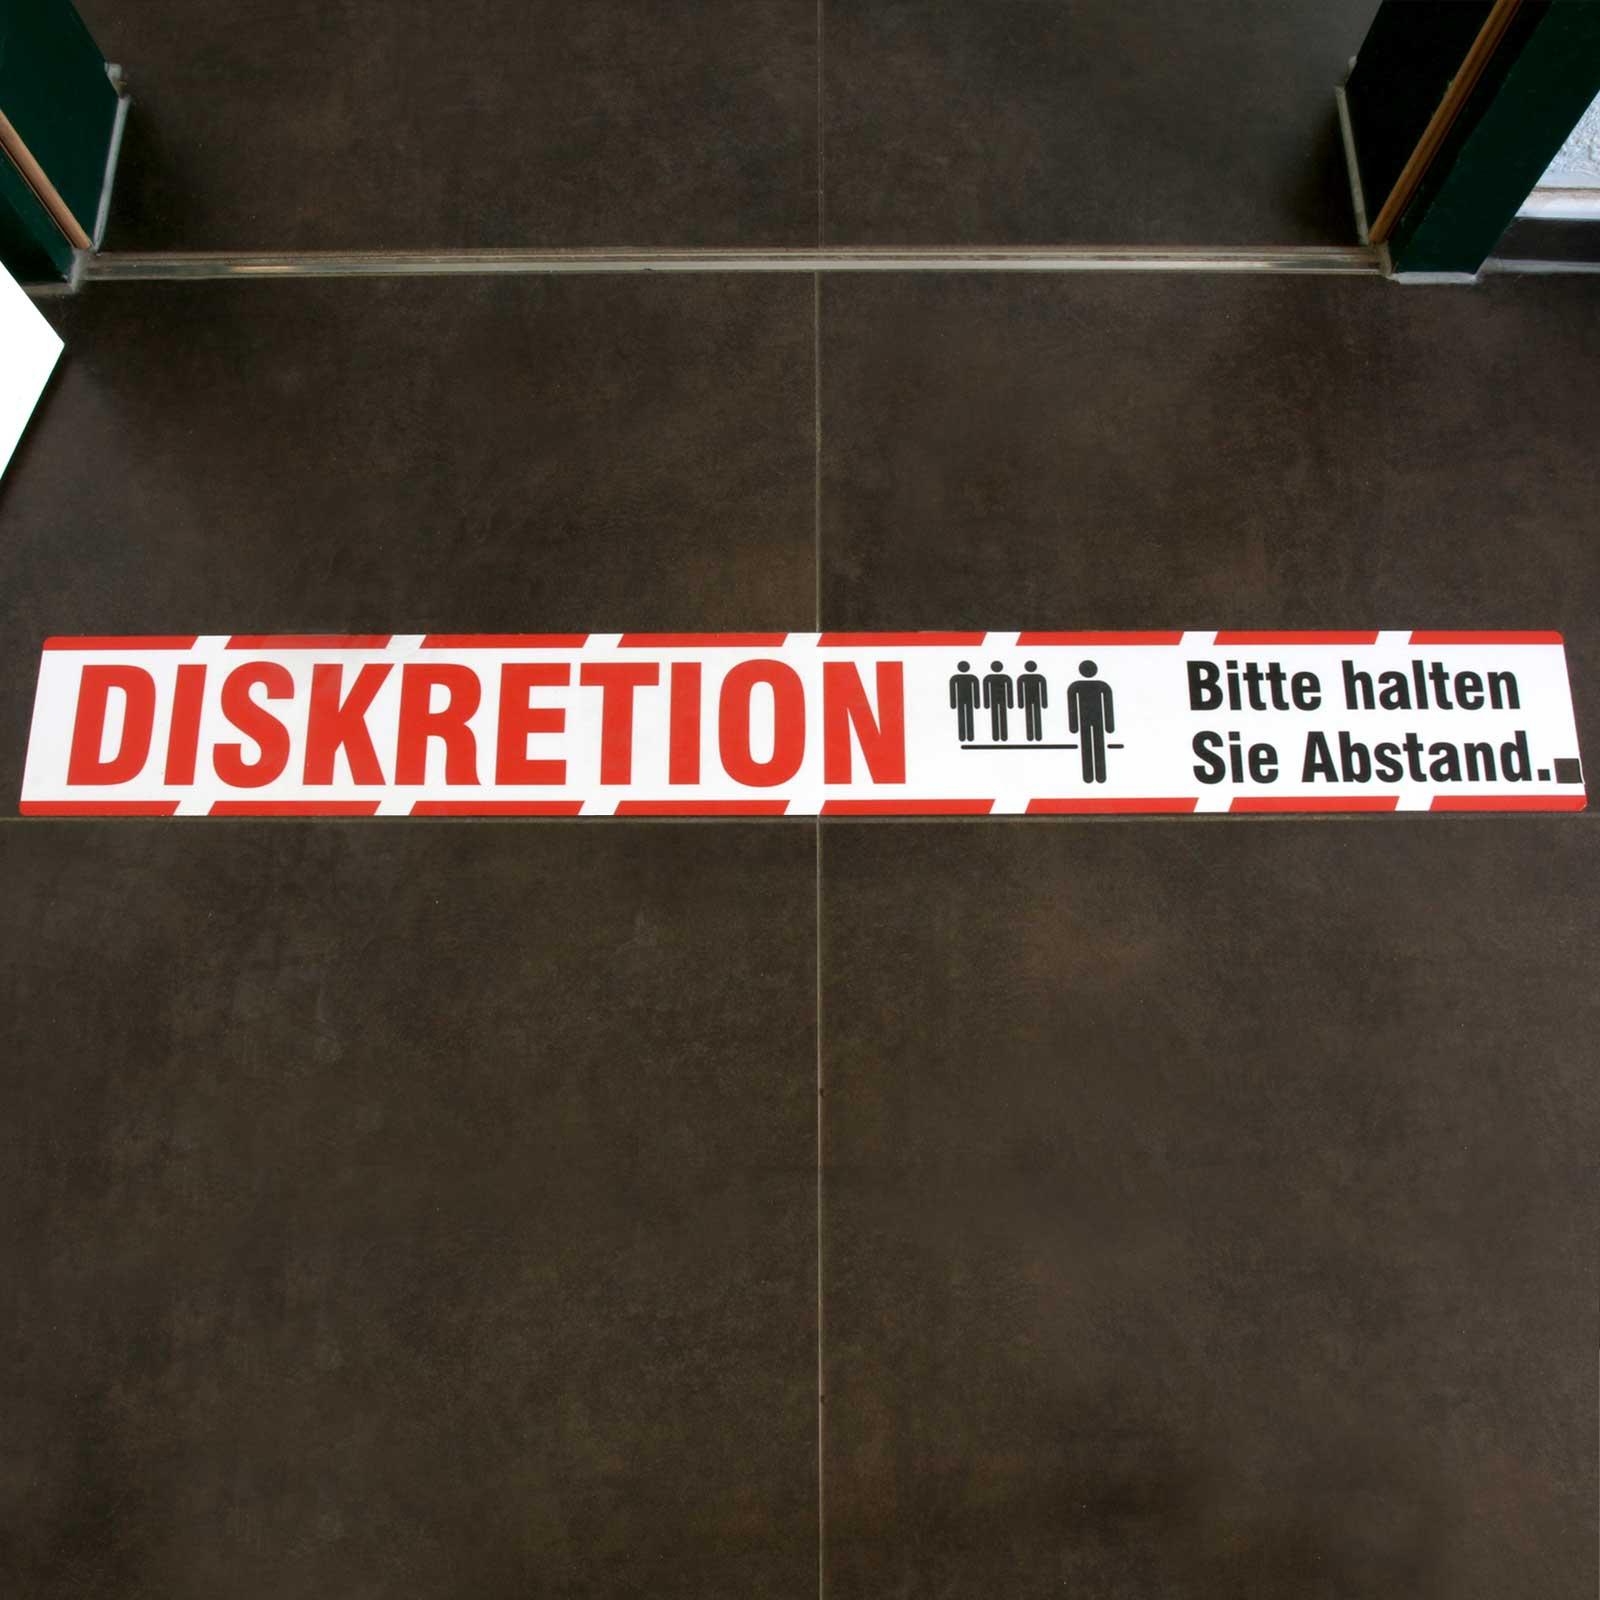 Diskretion Abstand Halten Aufkleber Fußbodenaufkleber Laminat 90x11 Cm